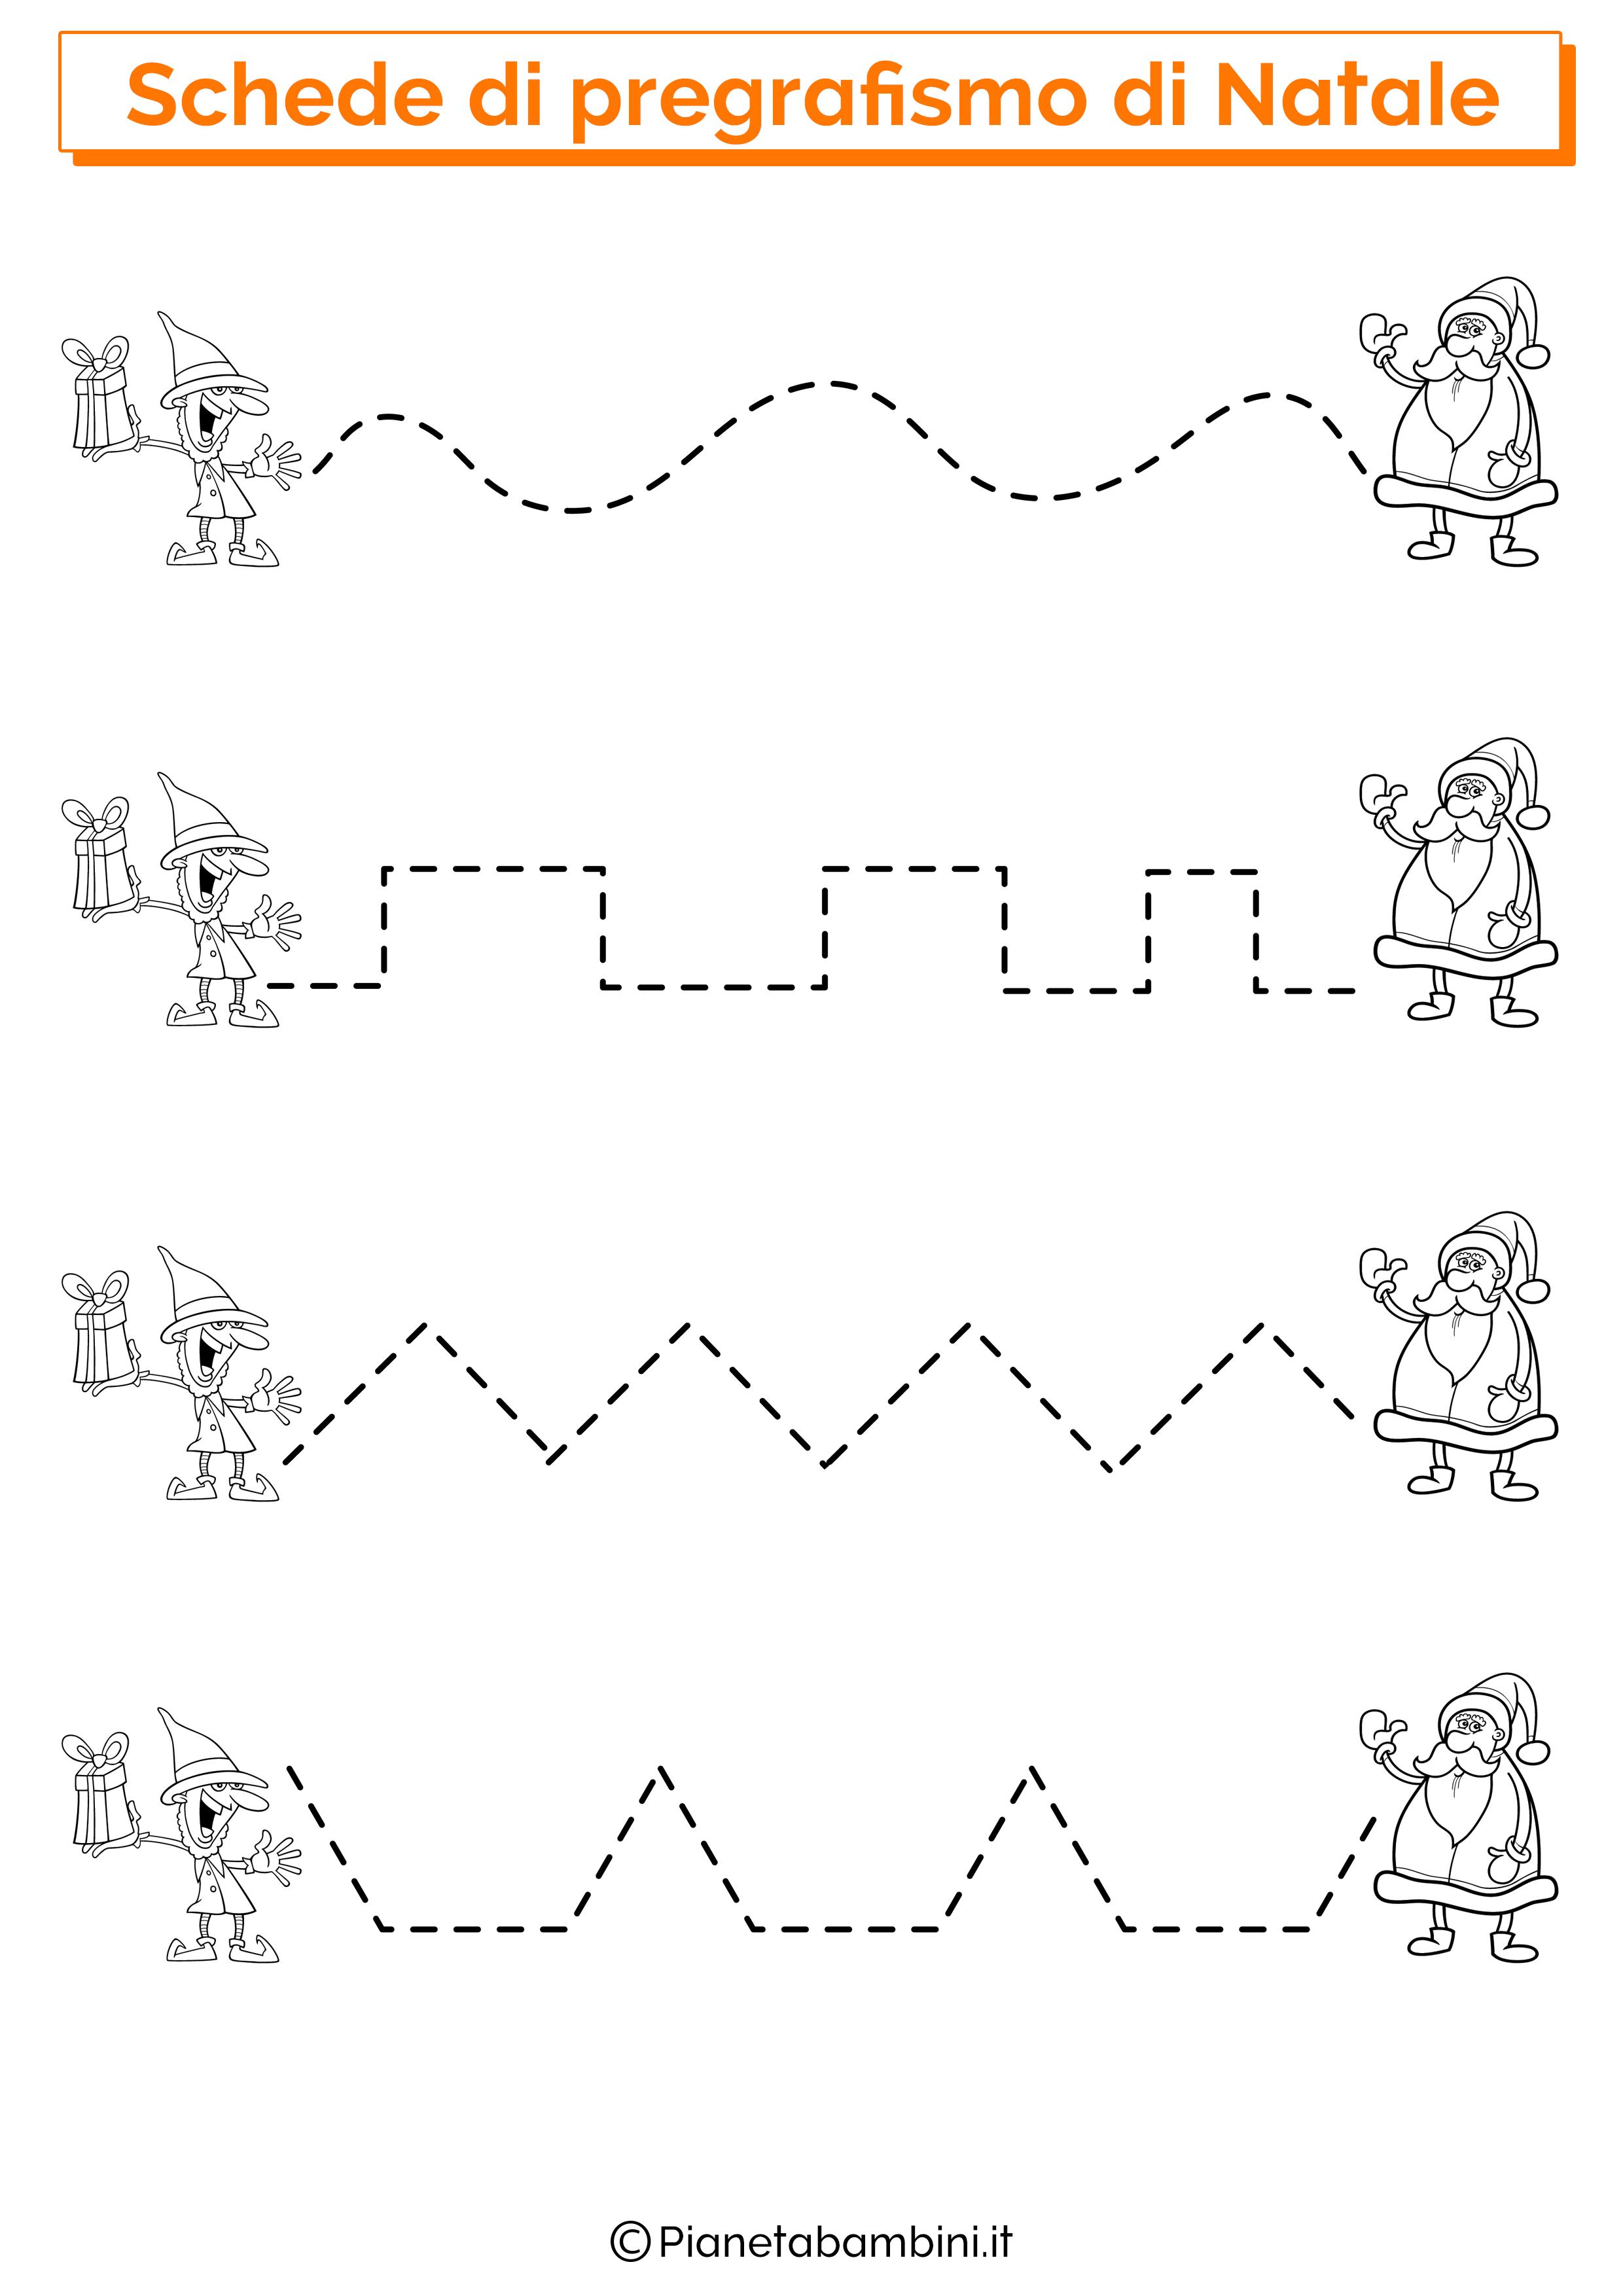 Schede pregrafismo linee Natale 04